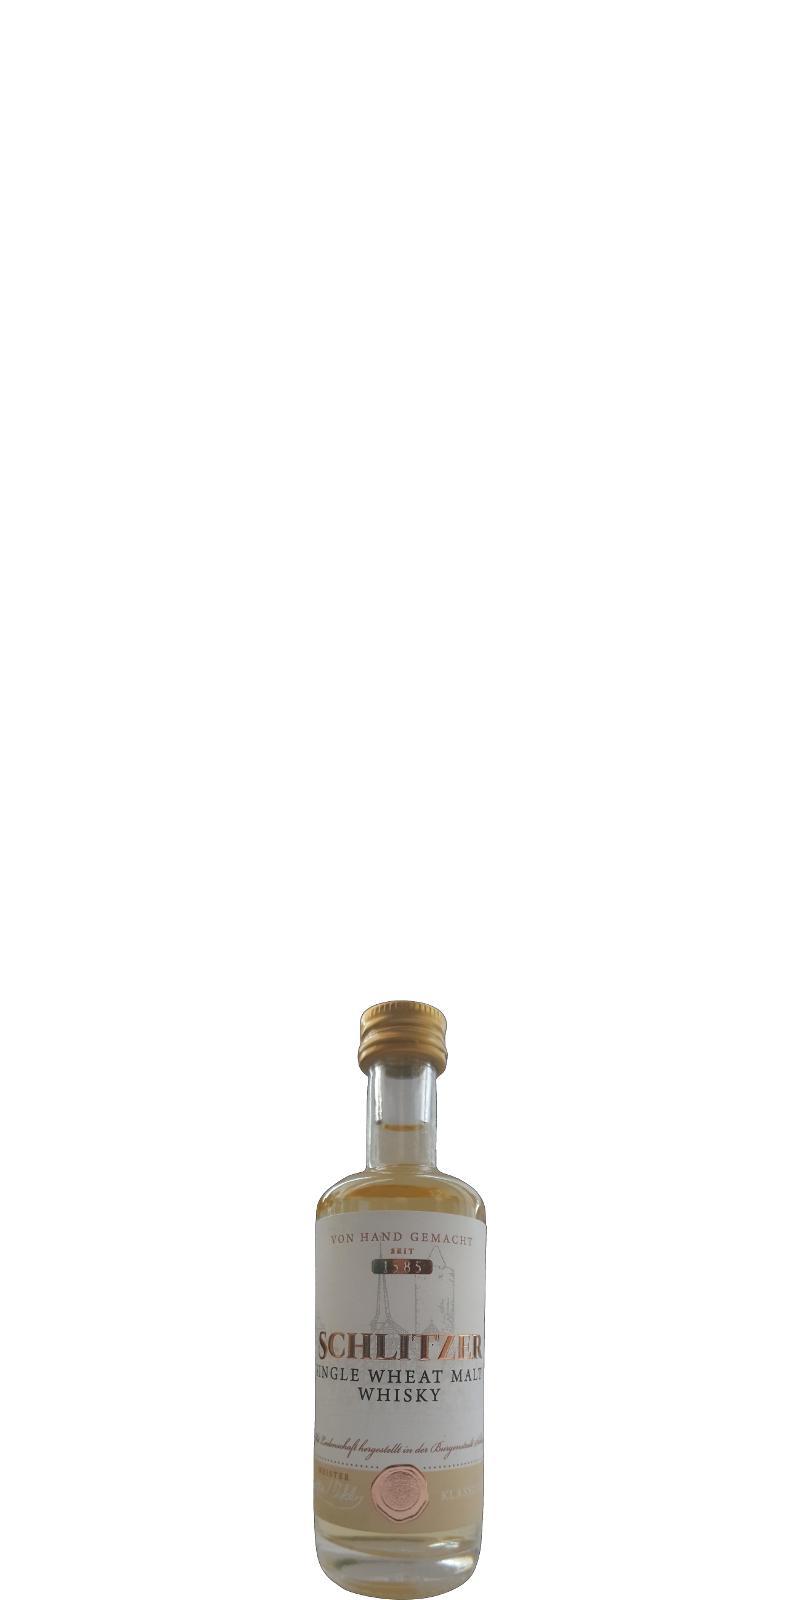 Schlitzer Single Wheat Malt Whisky